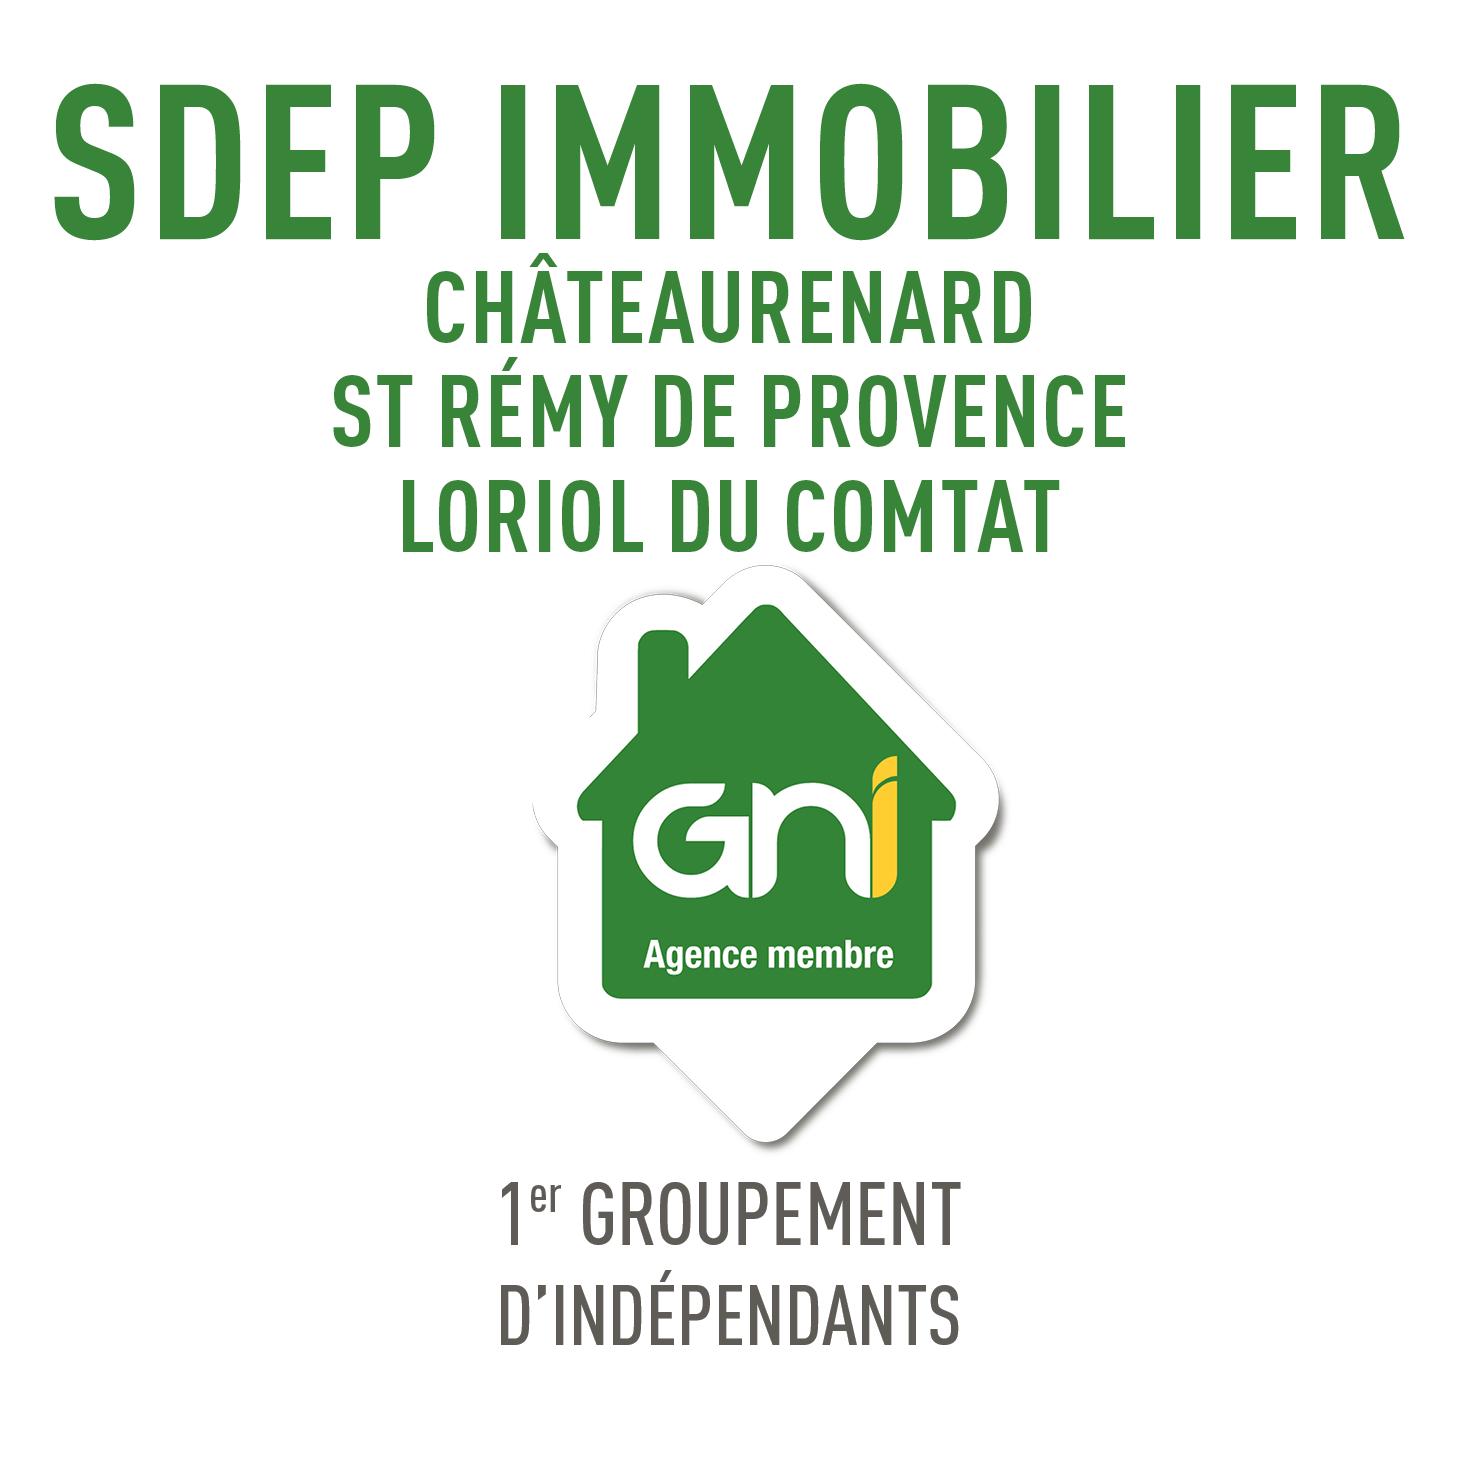 Logo Sdep Chateaurenard Immobilier